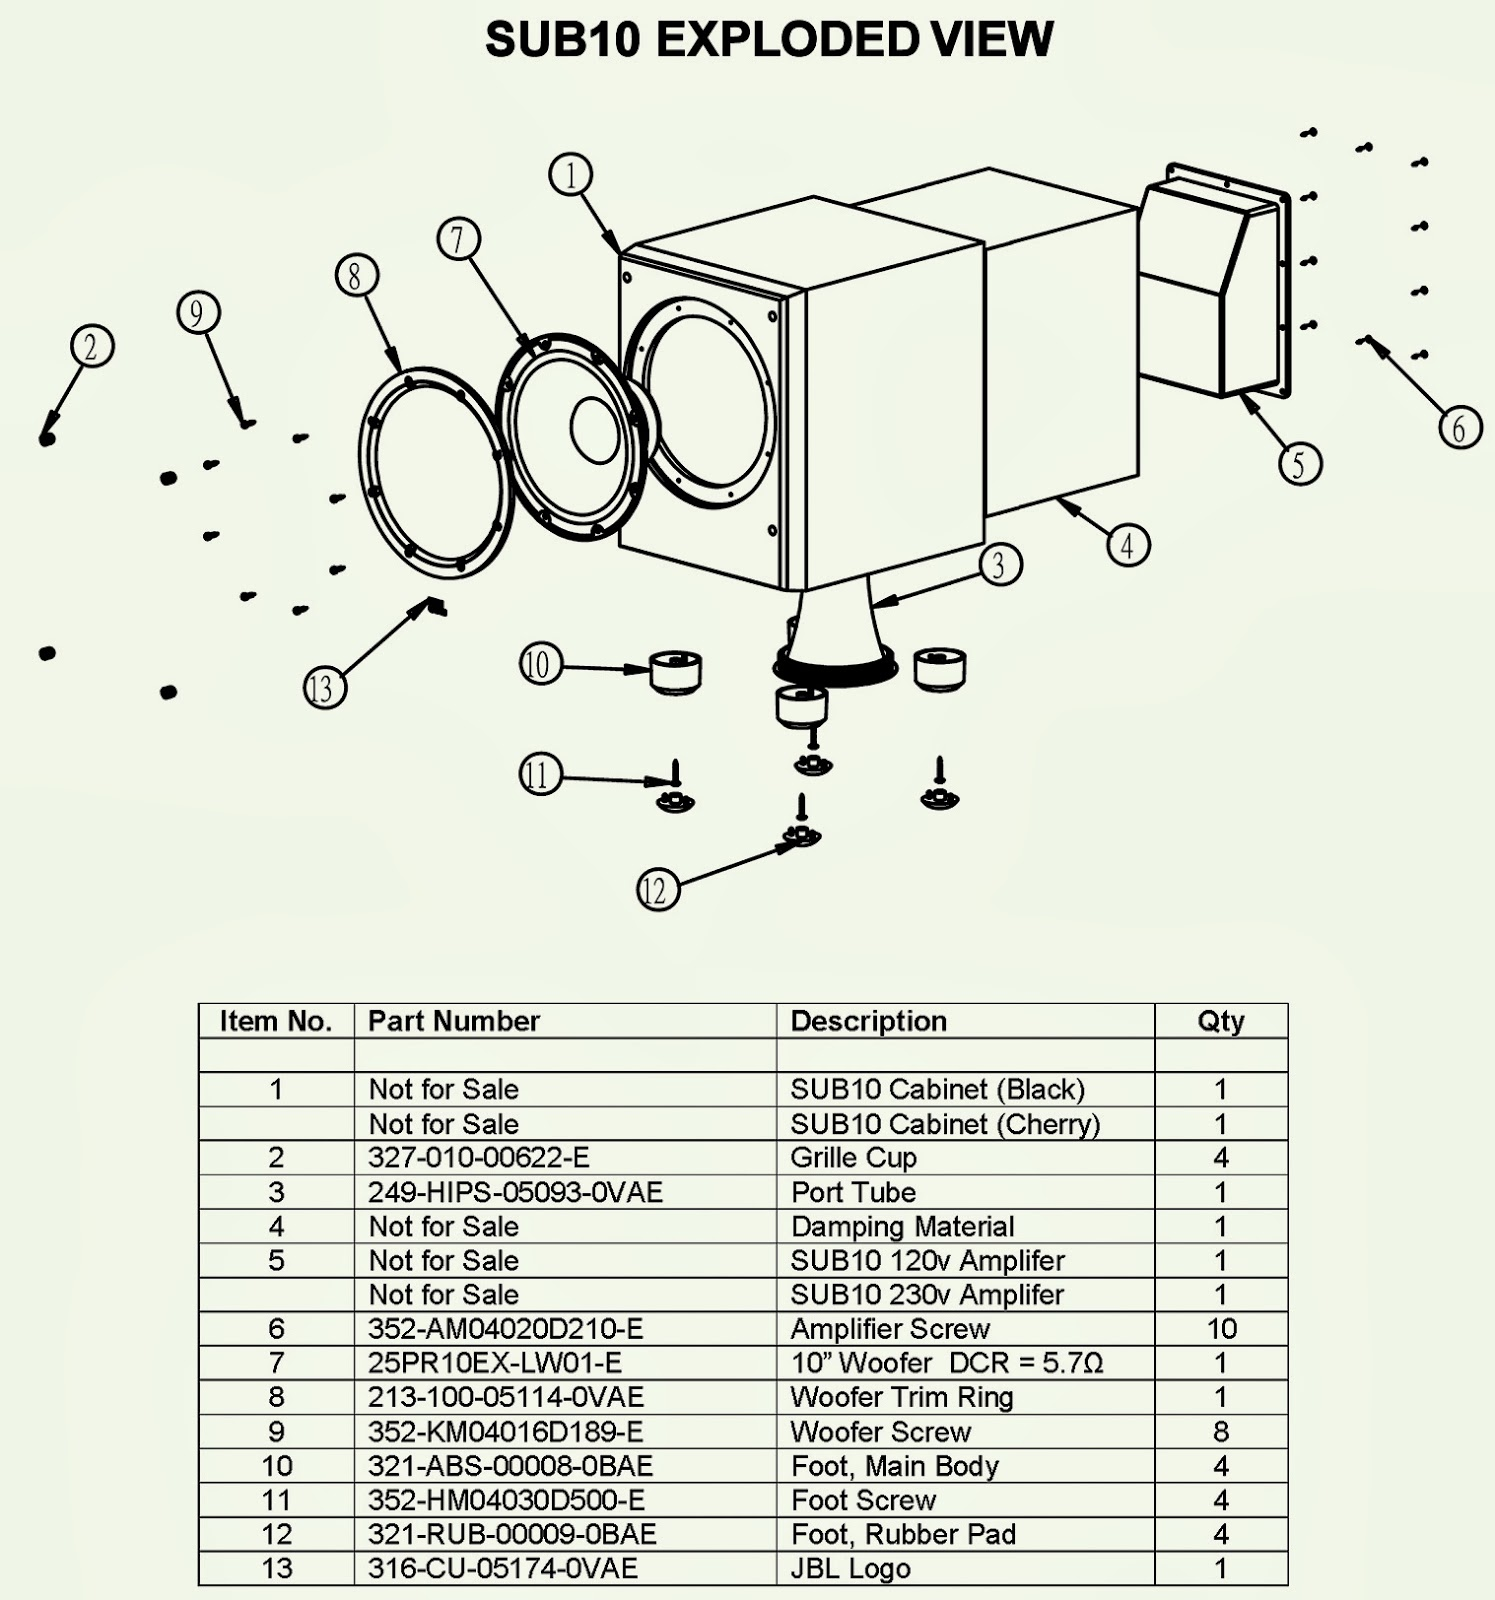 jbl sub 10 sub woofer schematic circuit diagram amp subwoofer jbl sub 10 sub [ 1495 x 1600 Pixel ]